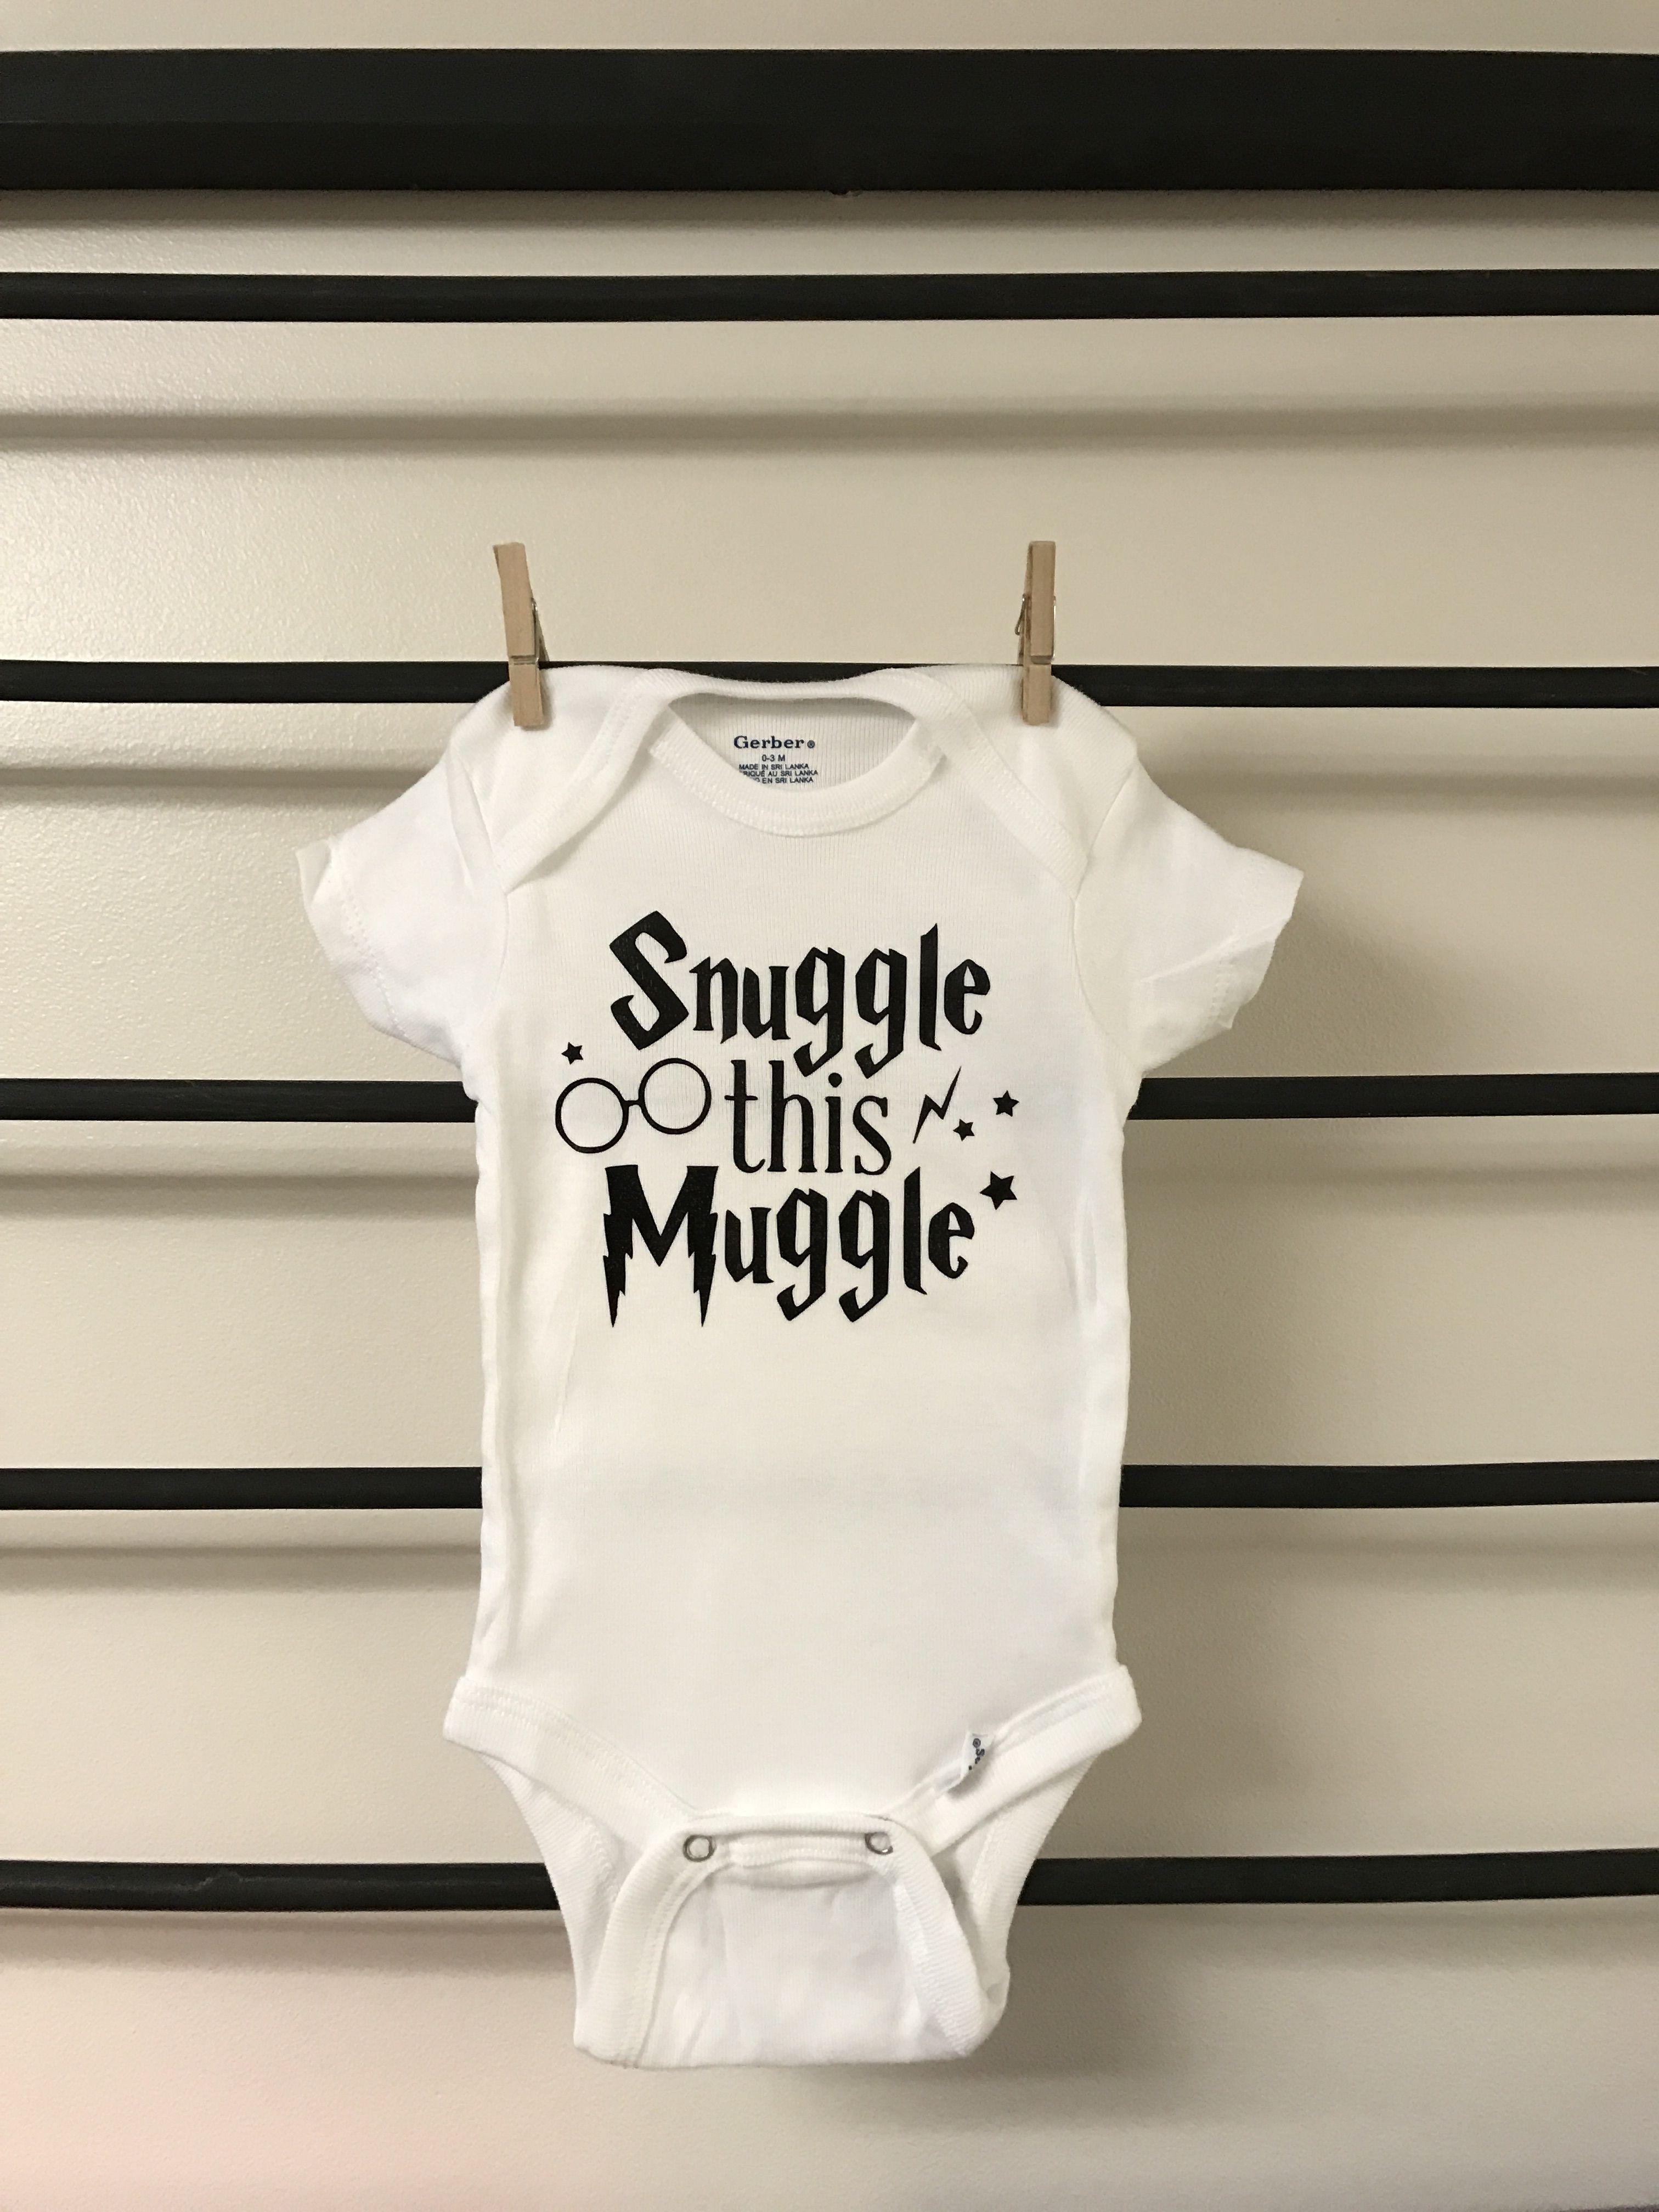 cc6a50340dd Snuggle this Muggle custom baby onesie. Message us here to order   www.facebook.com wecreatecustomvinylcuts